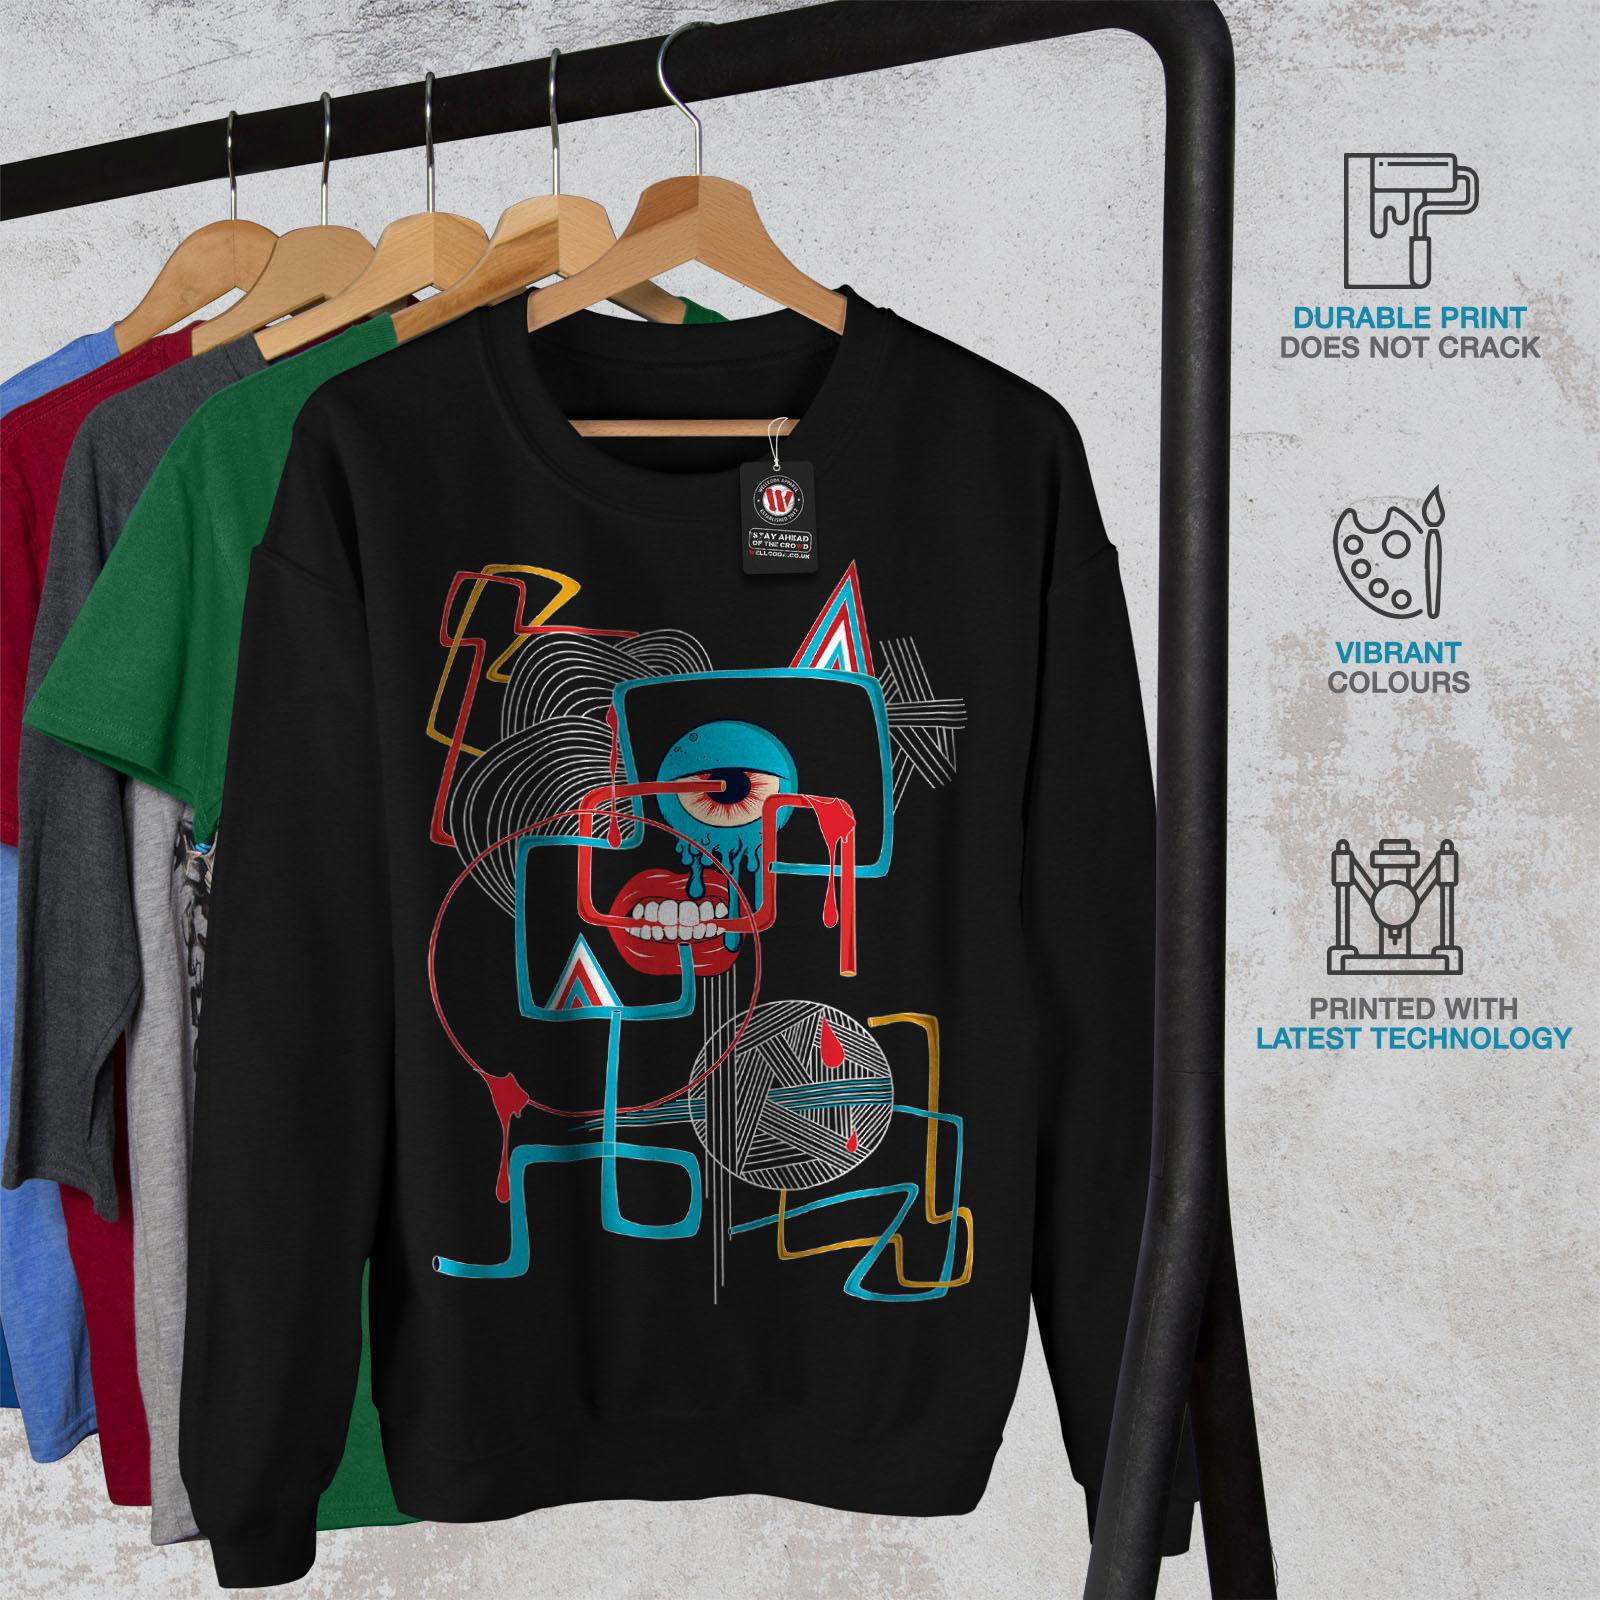 dᄄᆭcontractᄄᆭdr Wellcoda Hommes Eye le Geometrical noir pull Fashion sweatshirtpull clJK1F